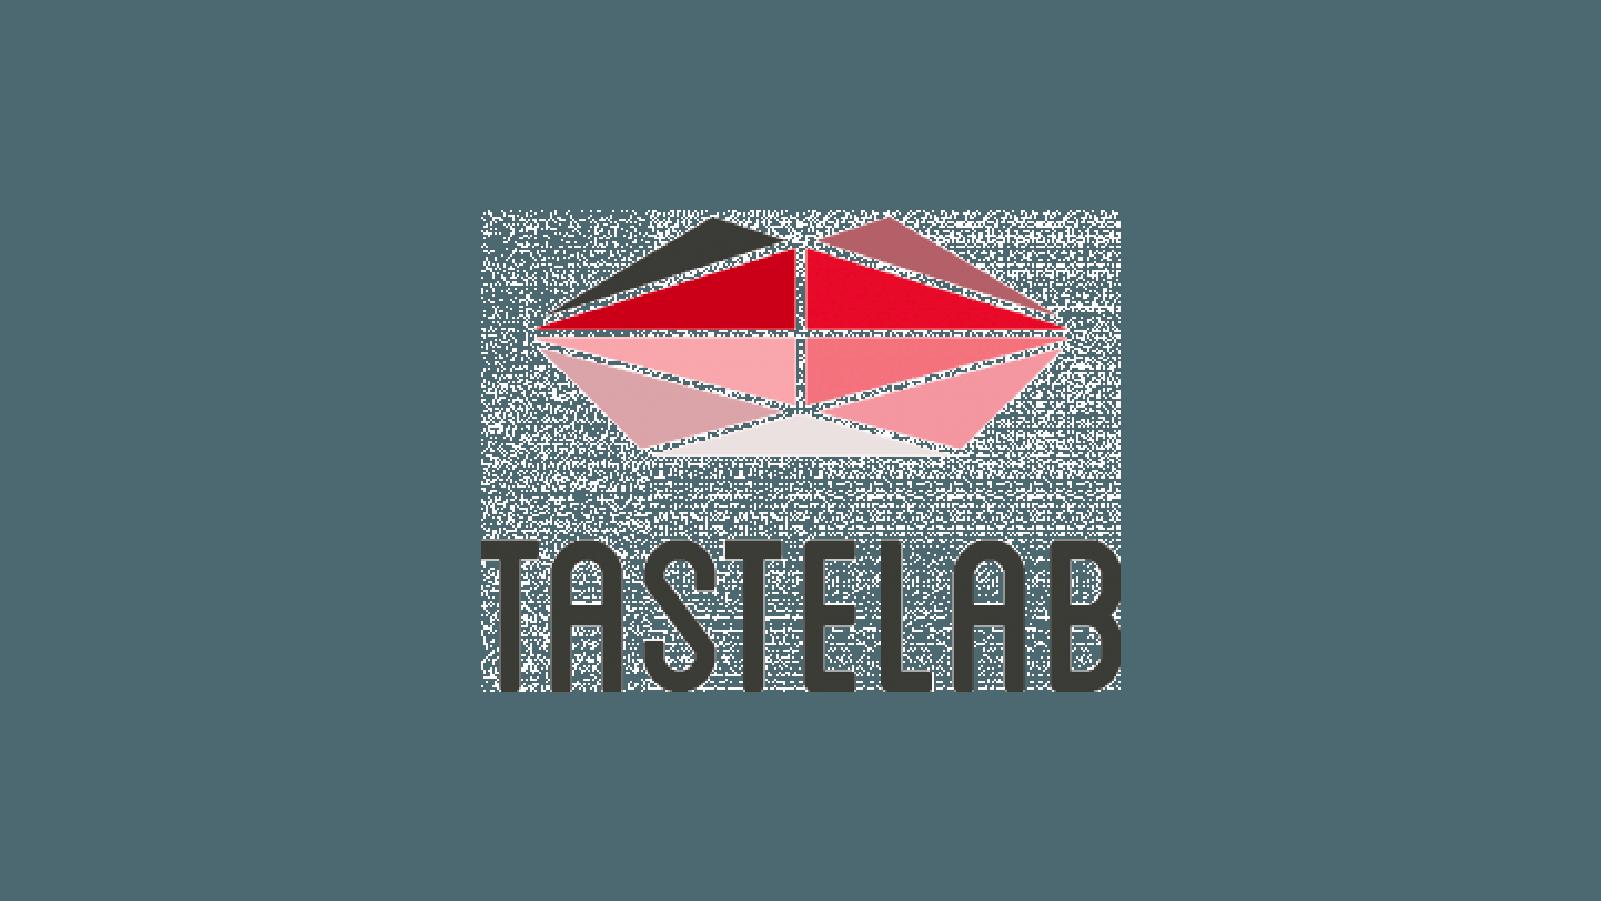 Tastelab logo